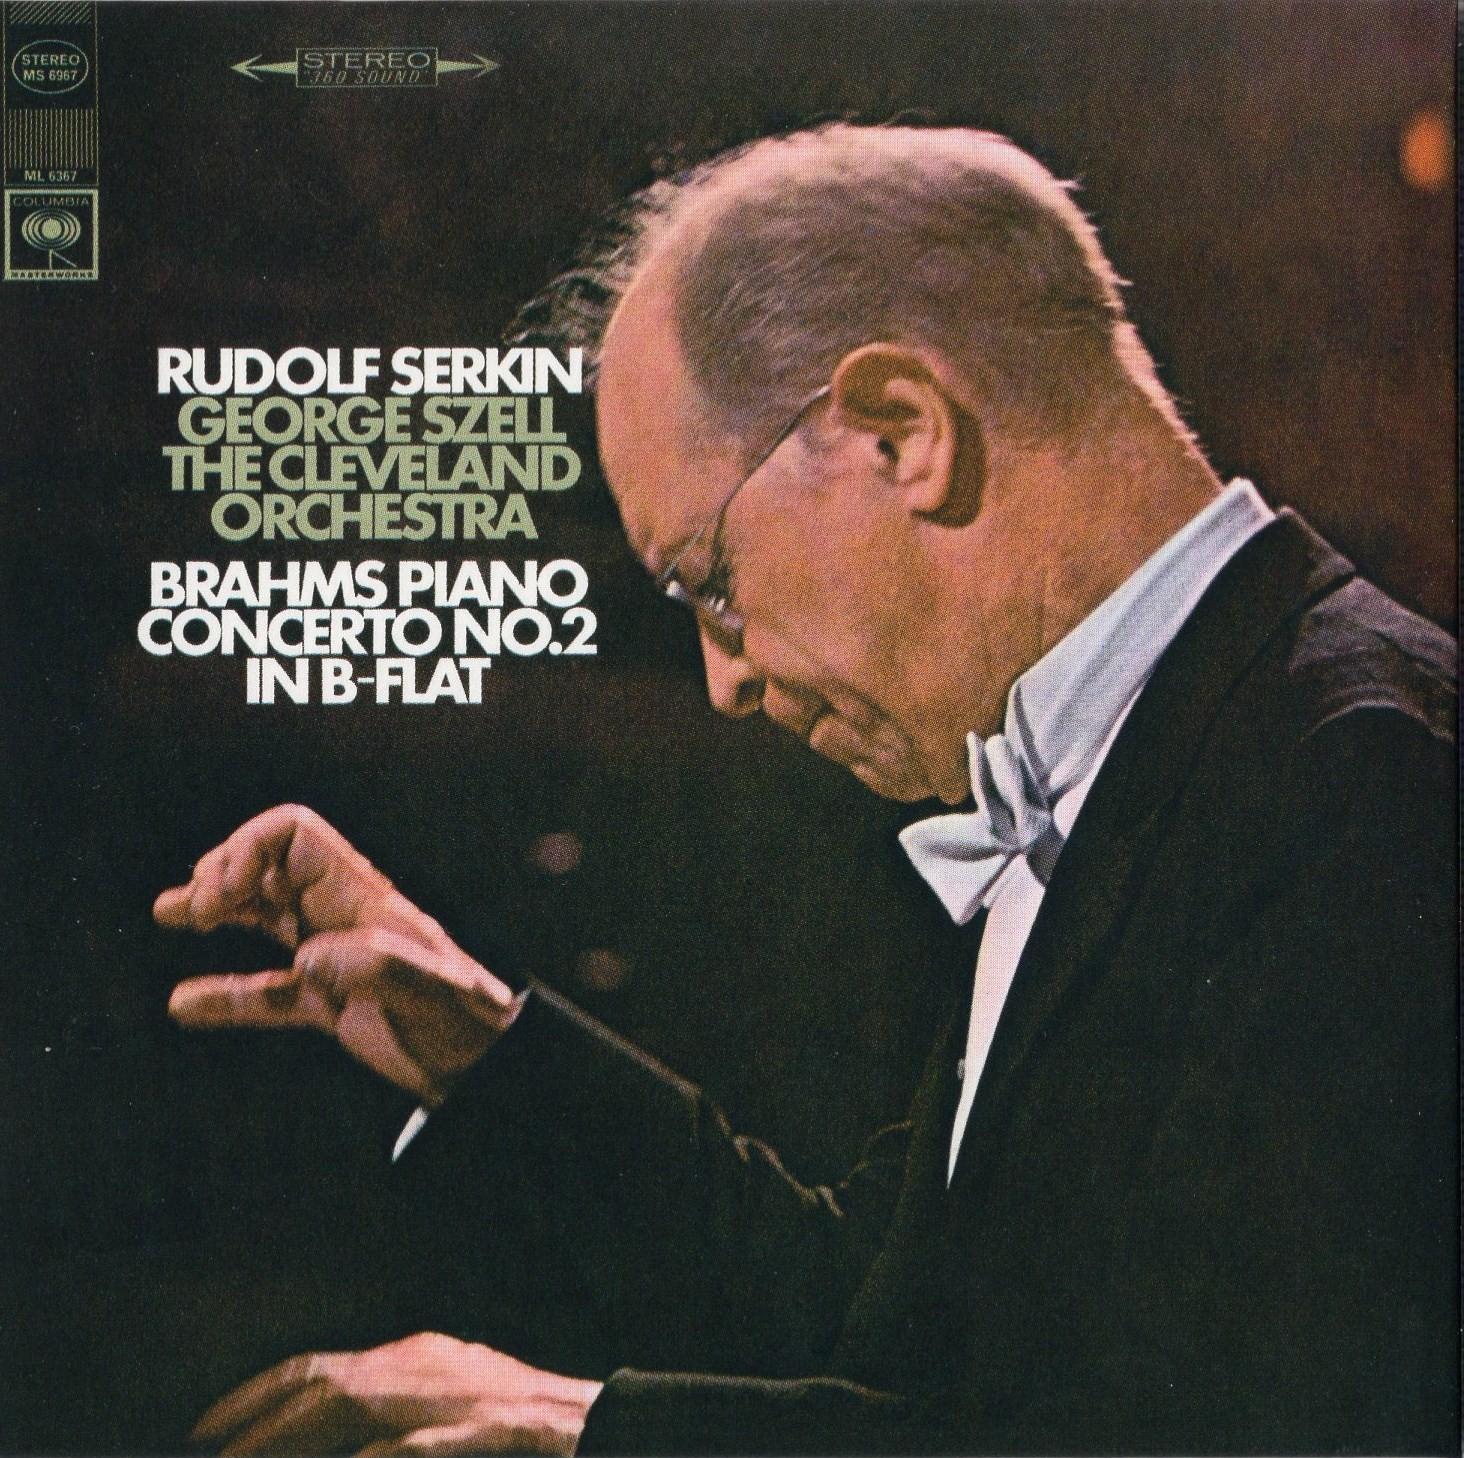 Rudolf Serkin - The Complete Columbia Album Collection CD53